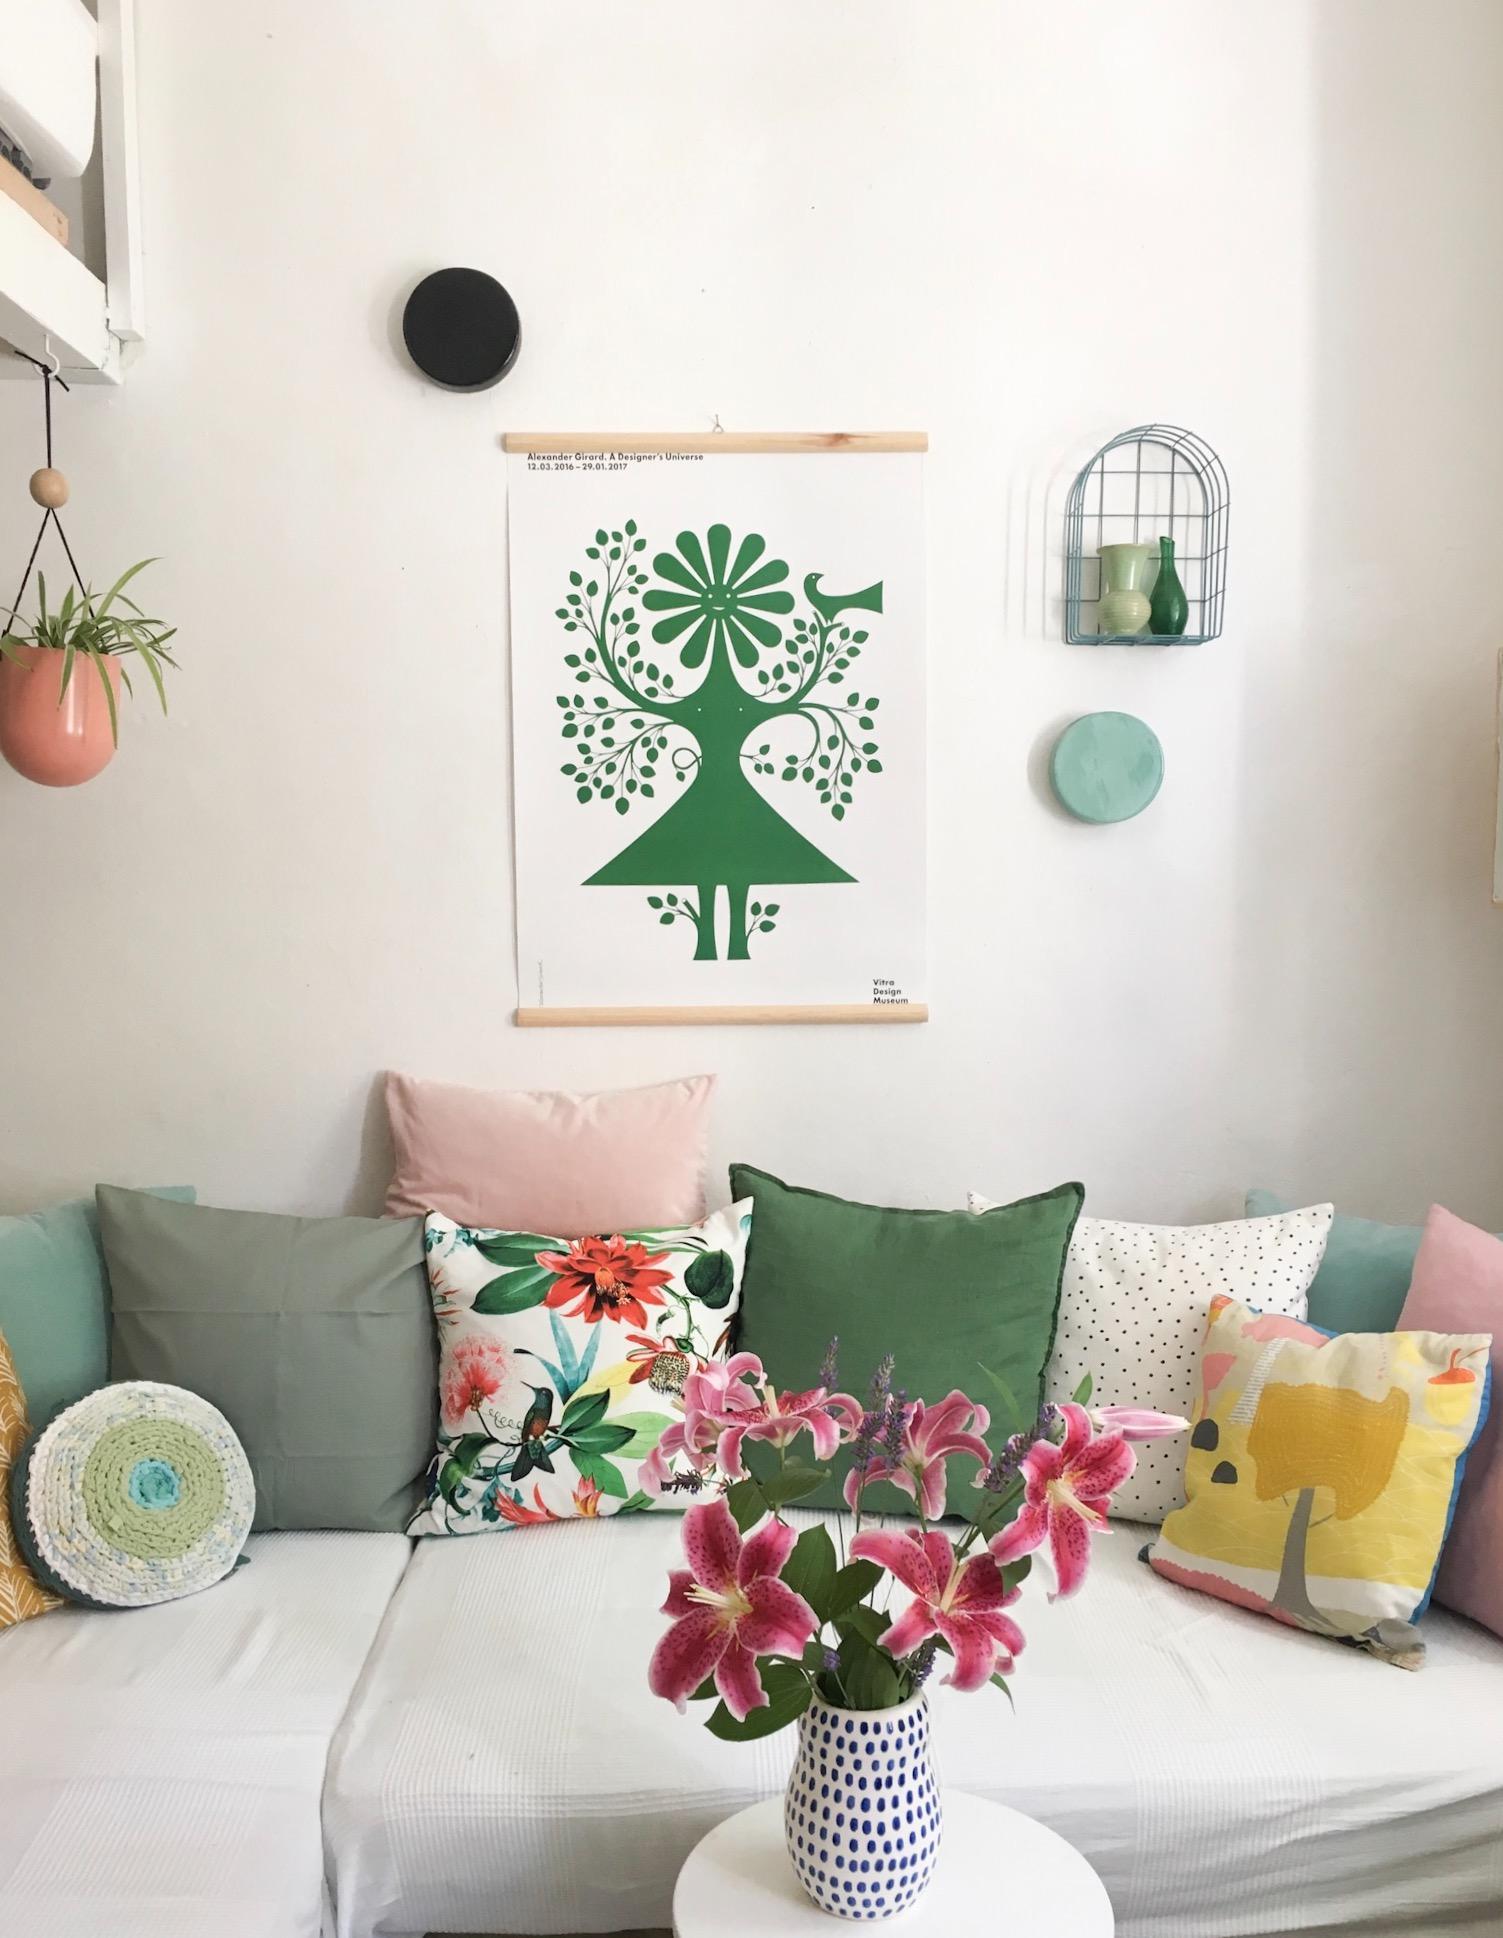 Kissenliebe Kissen Wohnzimmer Sofa Ikea Farbe Vitra Diy